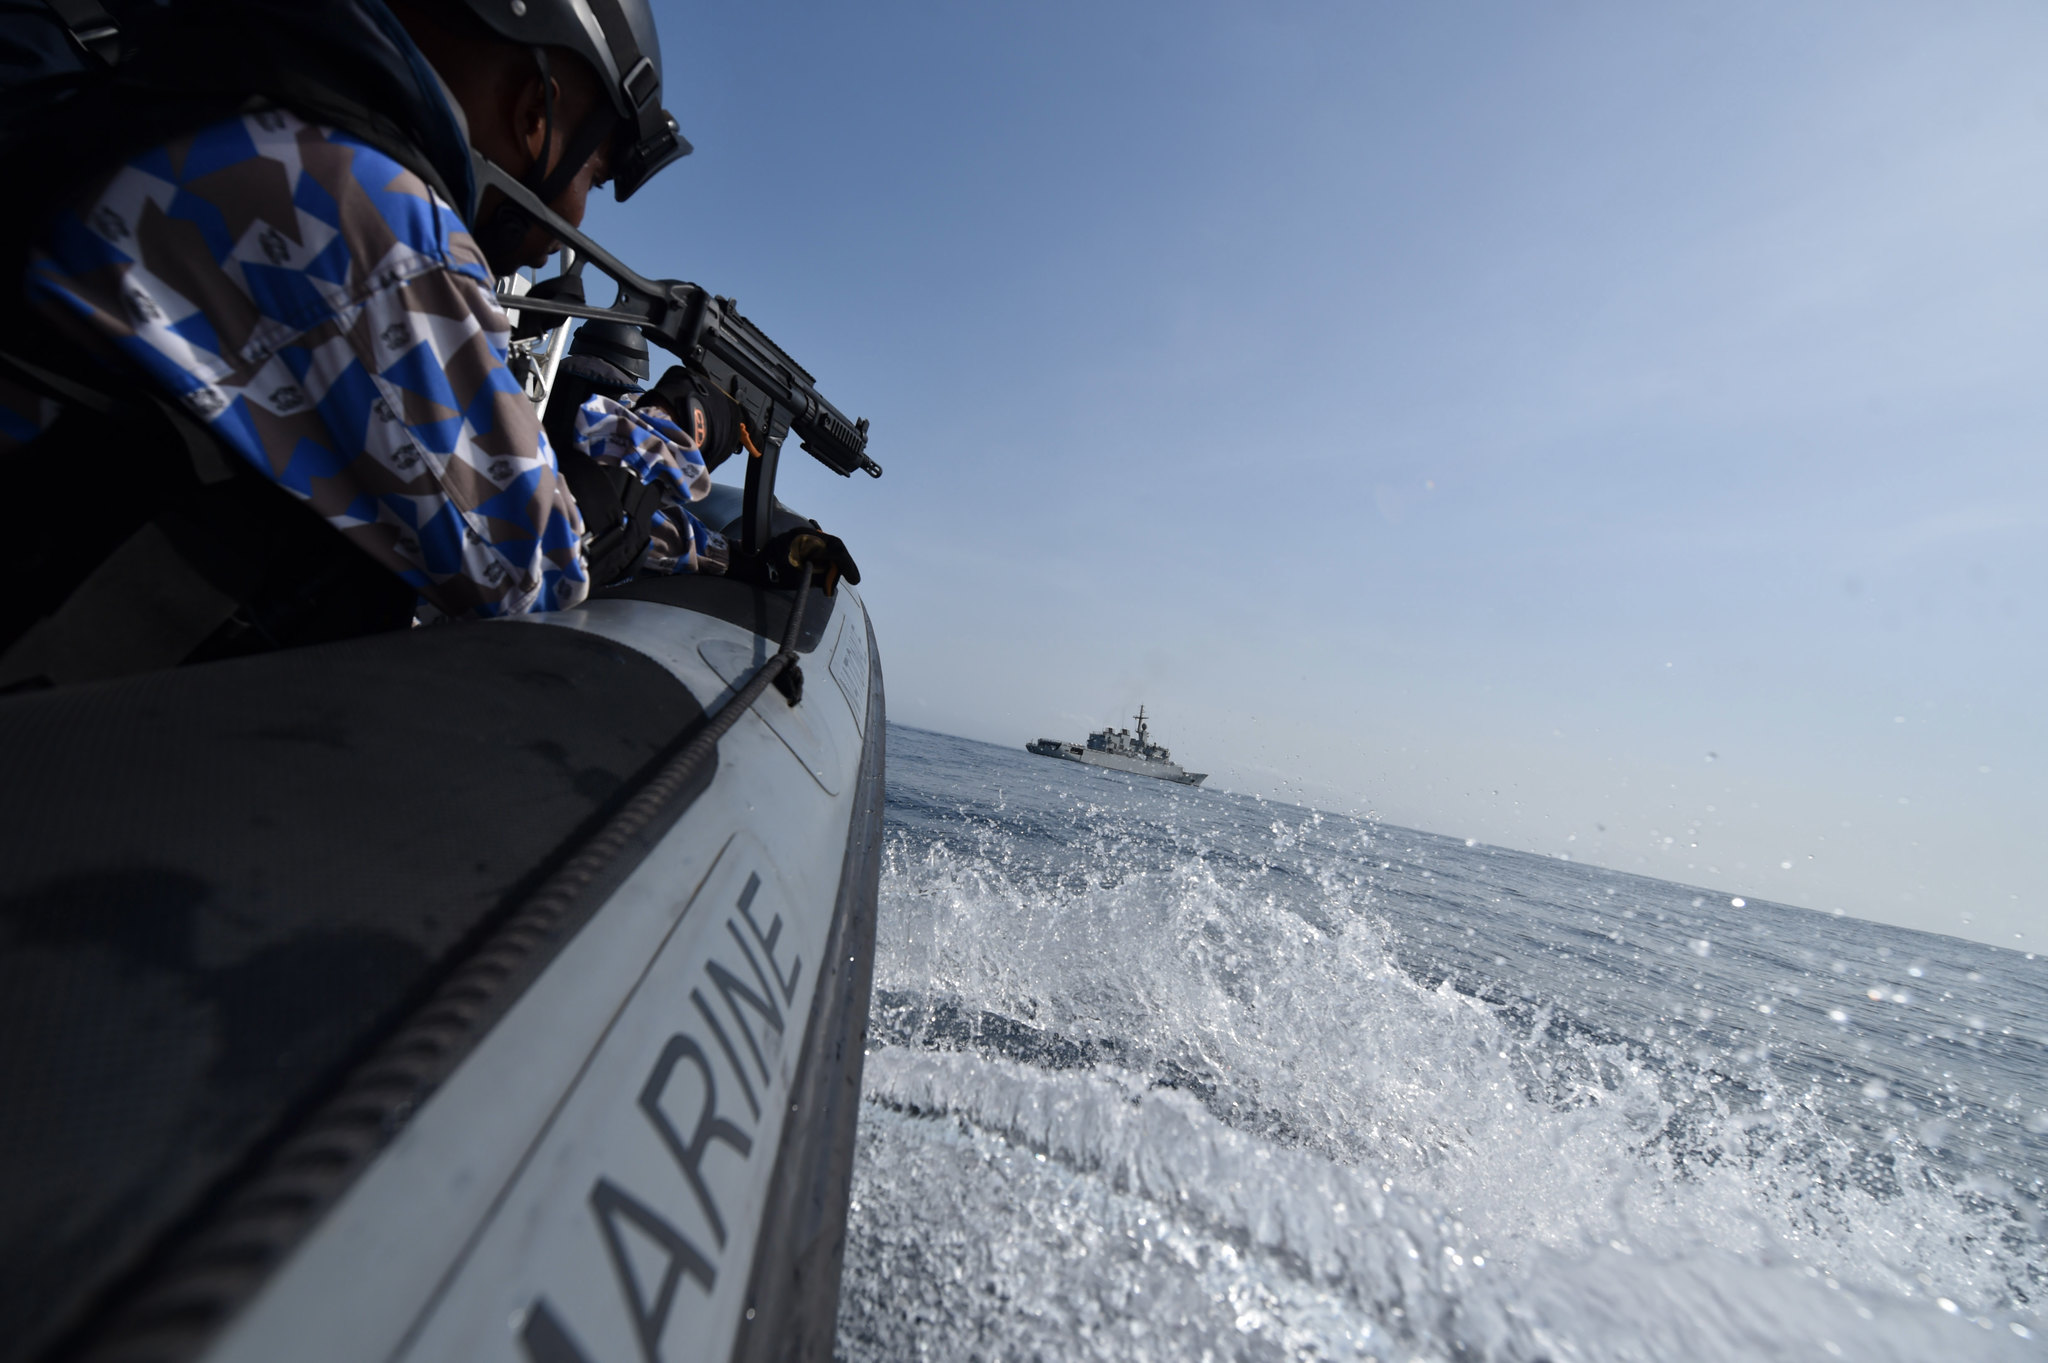 Royal Moroccan Navy Floréal Frigates / Frégates Floréal Marocaines - Page 12 33733730645_78eddb5dbb_k